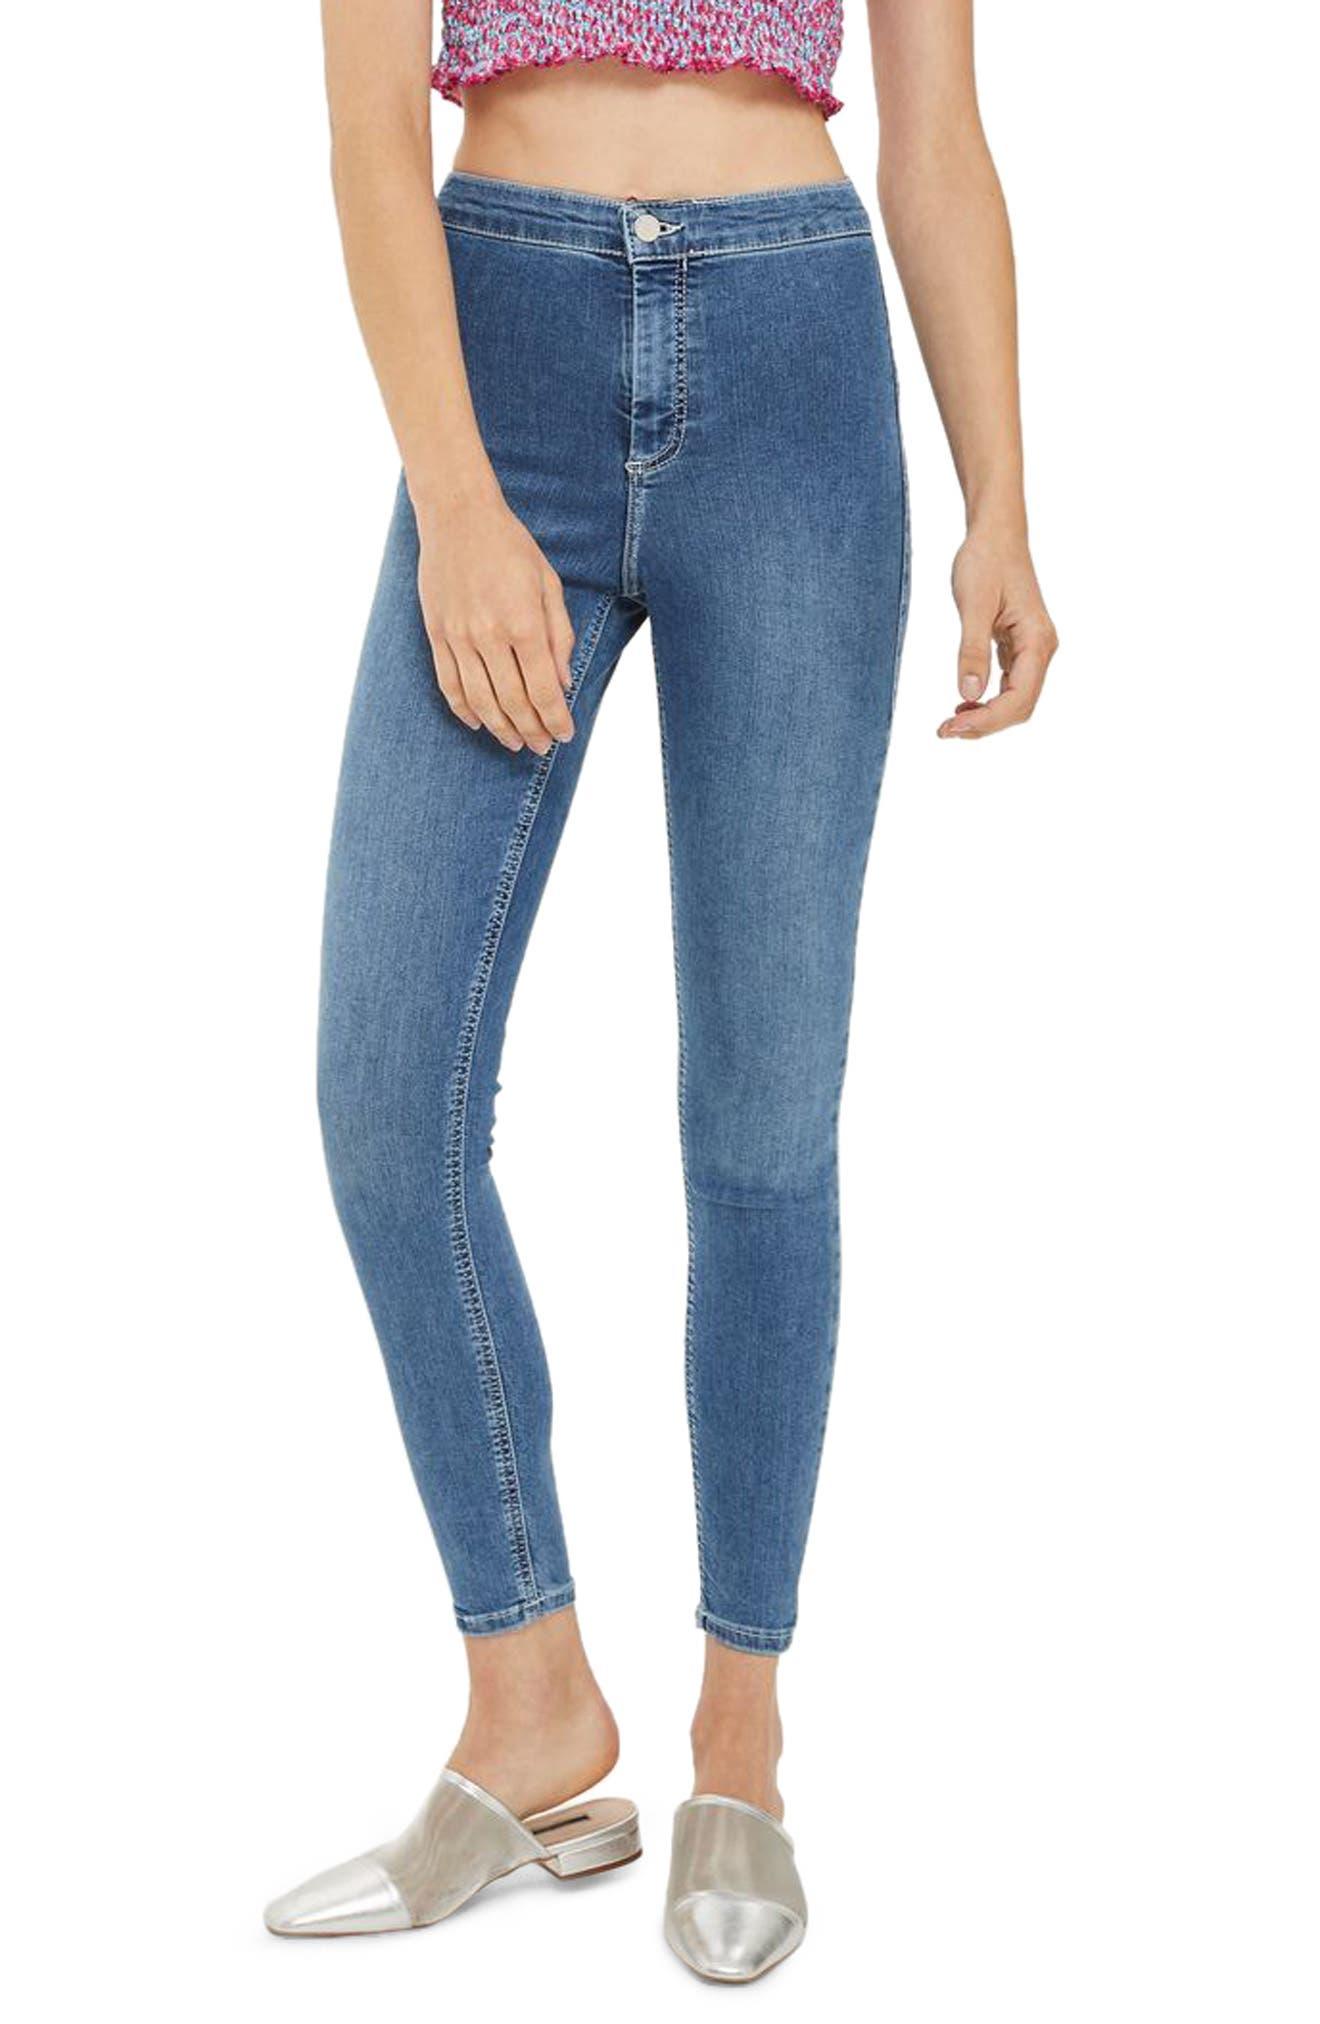 Topshop Joni Contrast Stitch High Rise Skinny Jeans